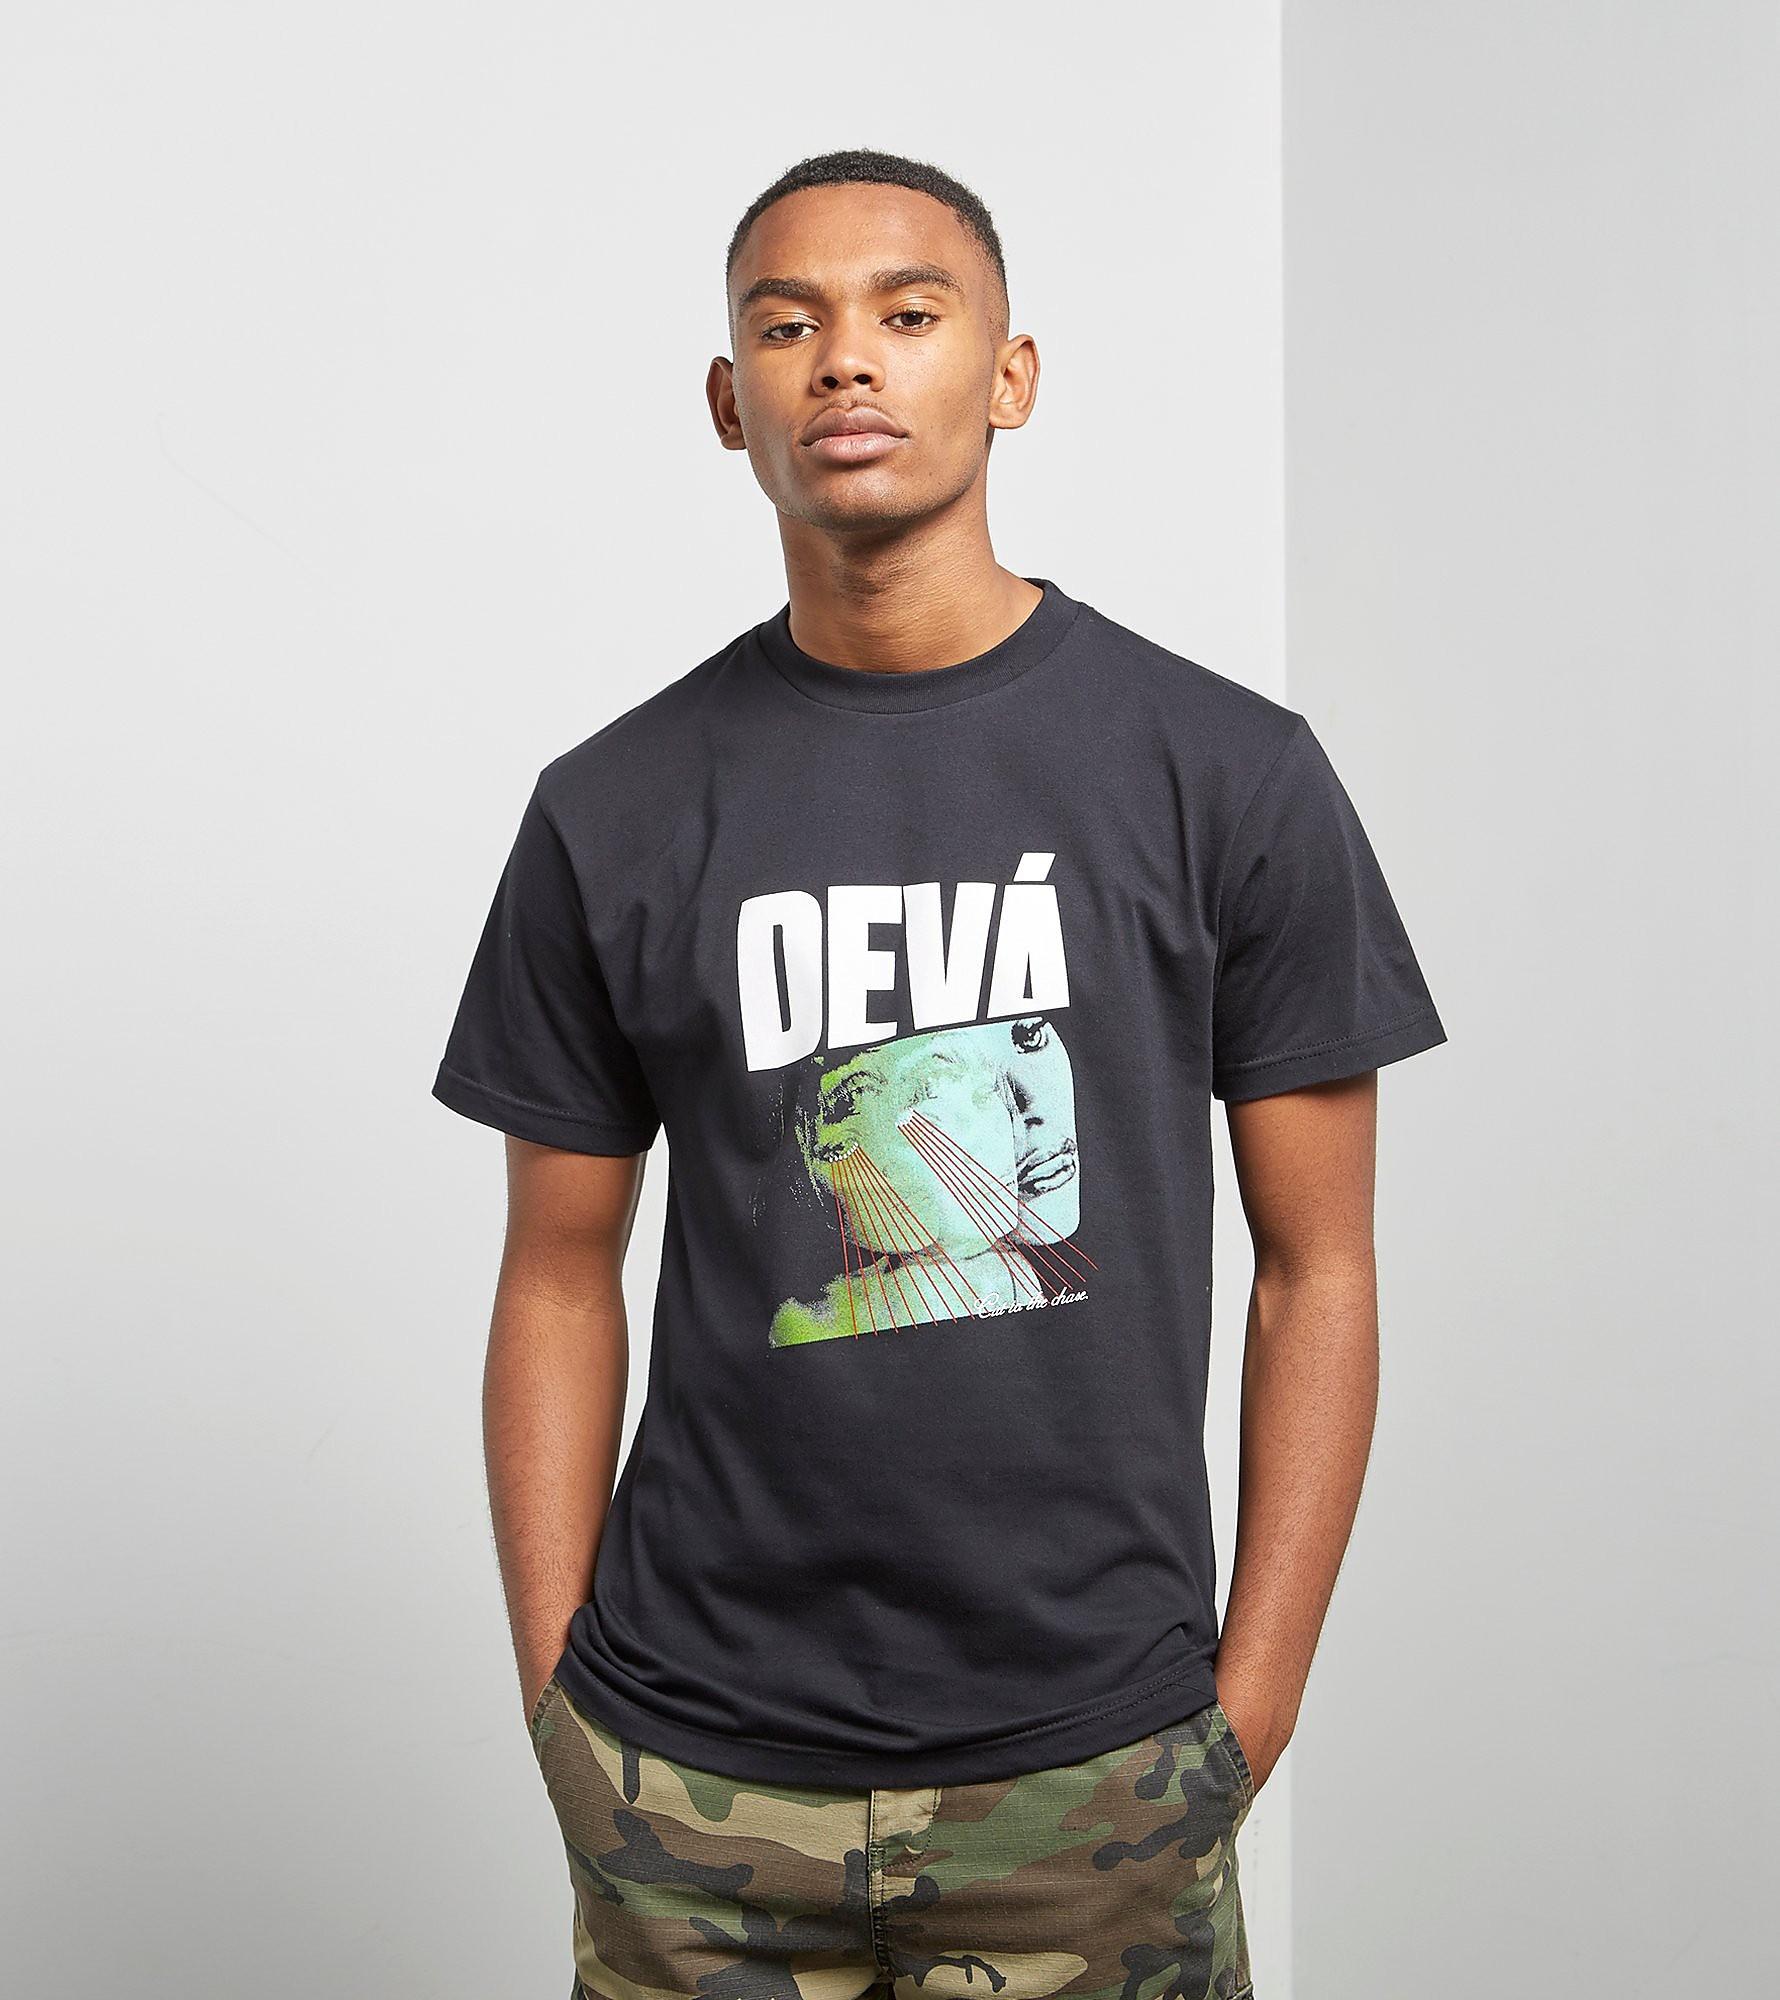 Deva States Cut the Chase T-Shirt